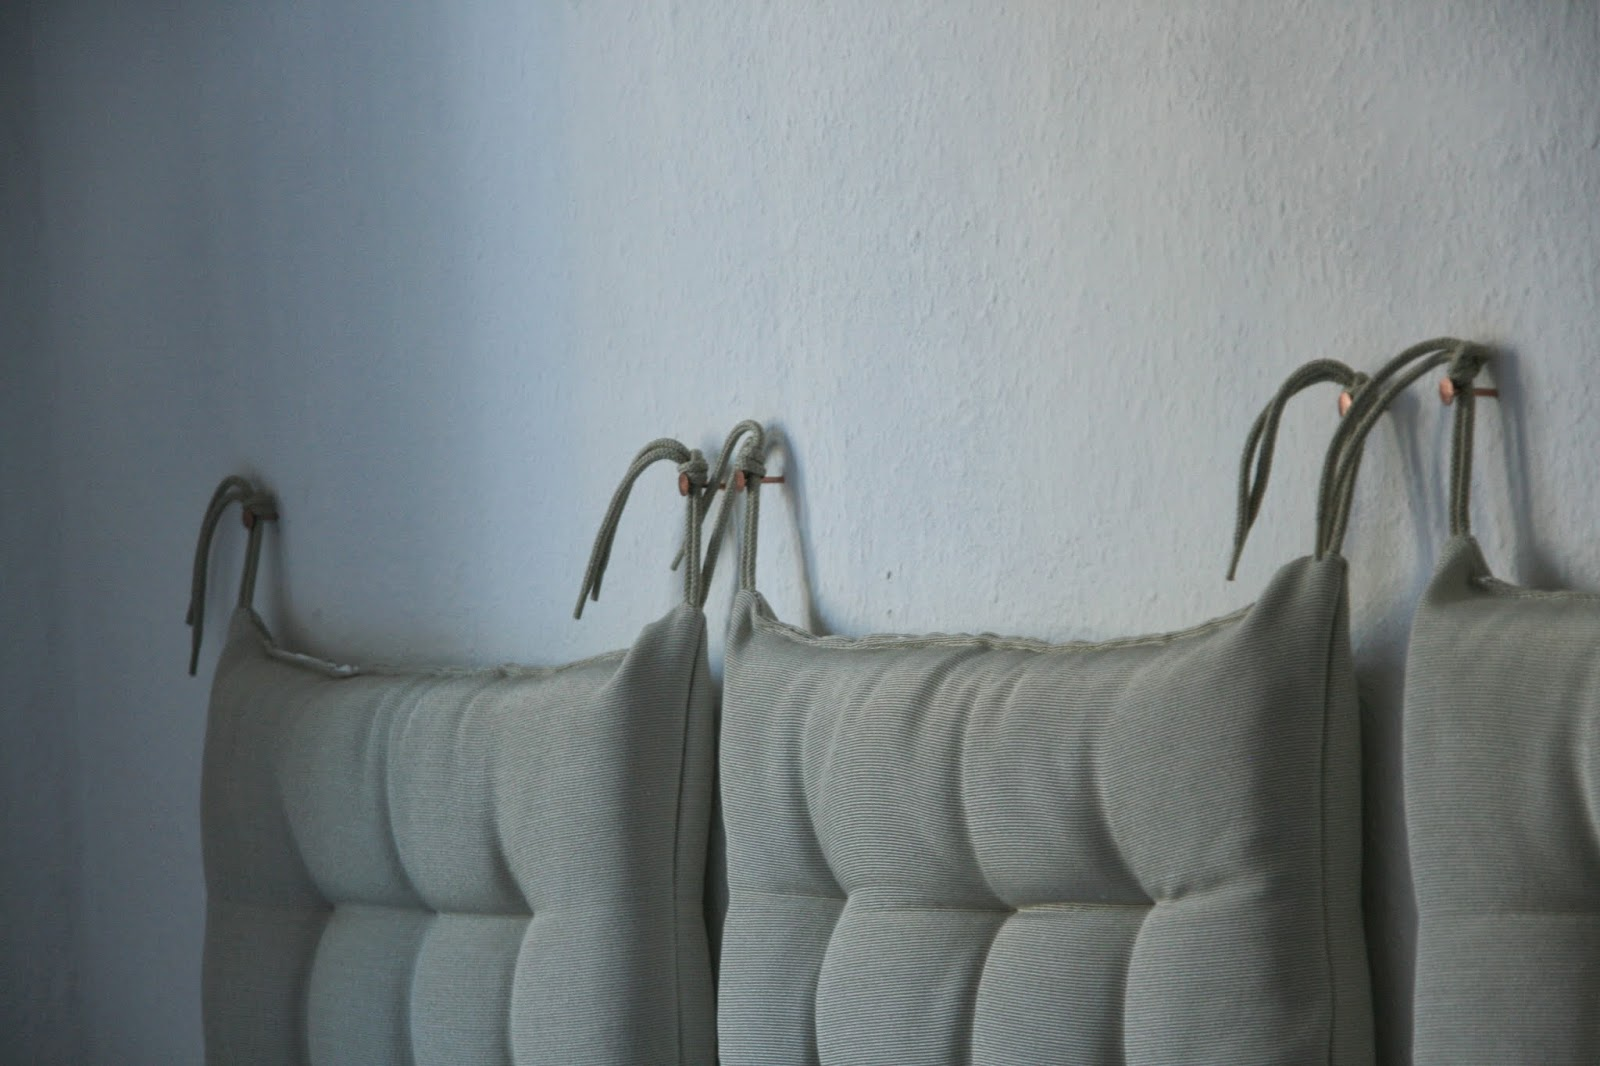 kissen an der wand befestigen ostseesuche com. Black Bedroom Furniture Sets. Home Design Ideas